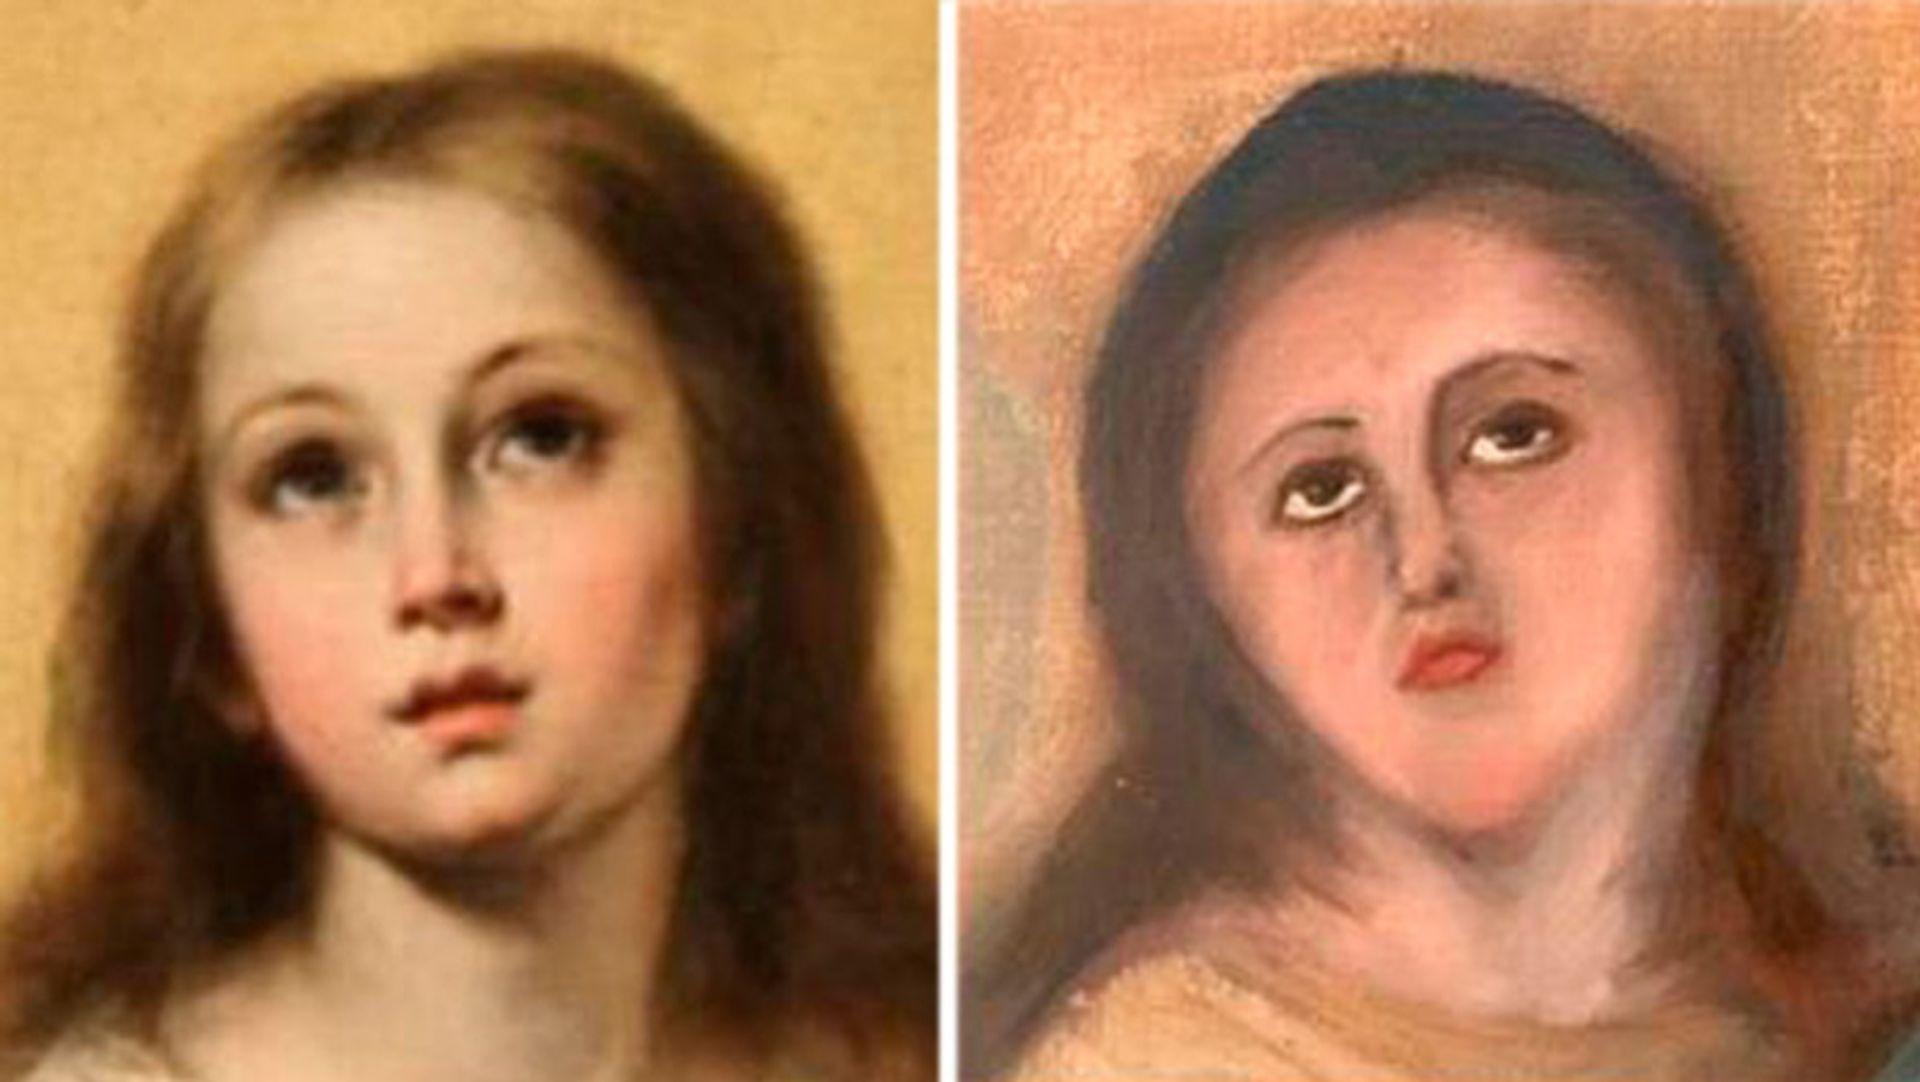 Bartolomé Esteban Murillo's original work (left) and one of the restoration attempts Photo: Cedida/Europa Press